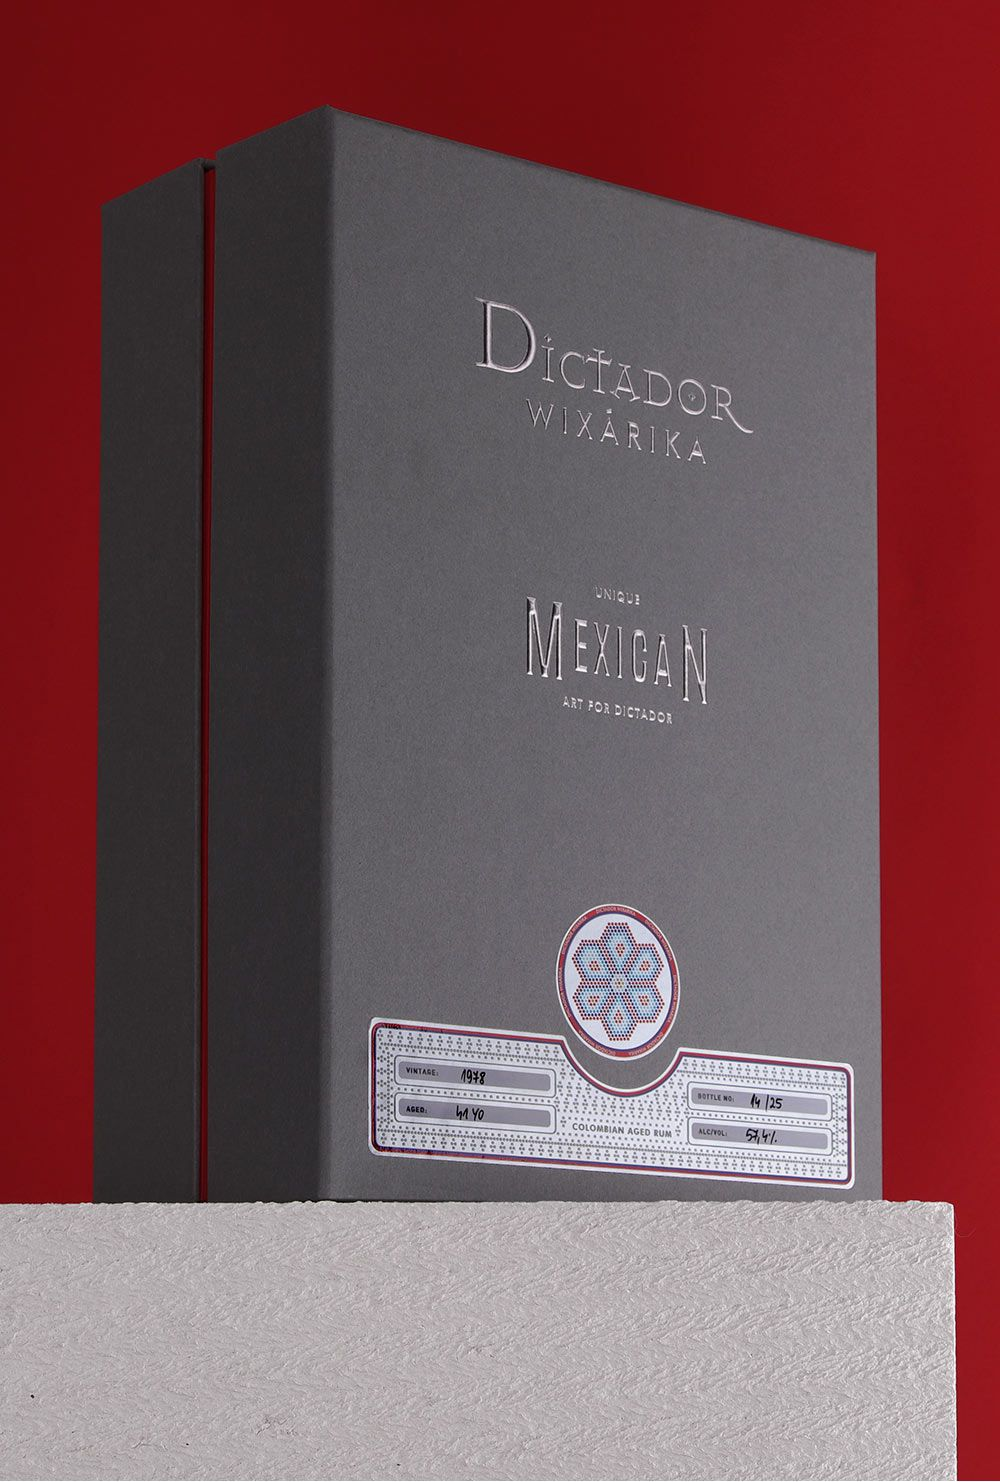 Dictador Wixarika - Model 2018/10